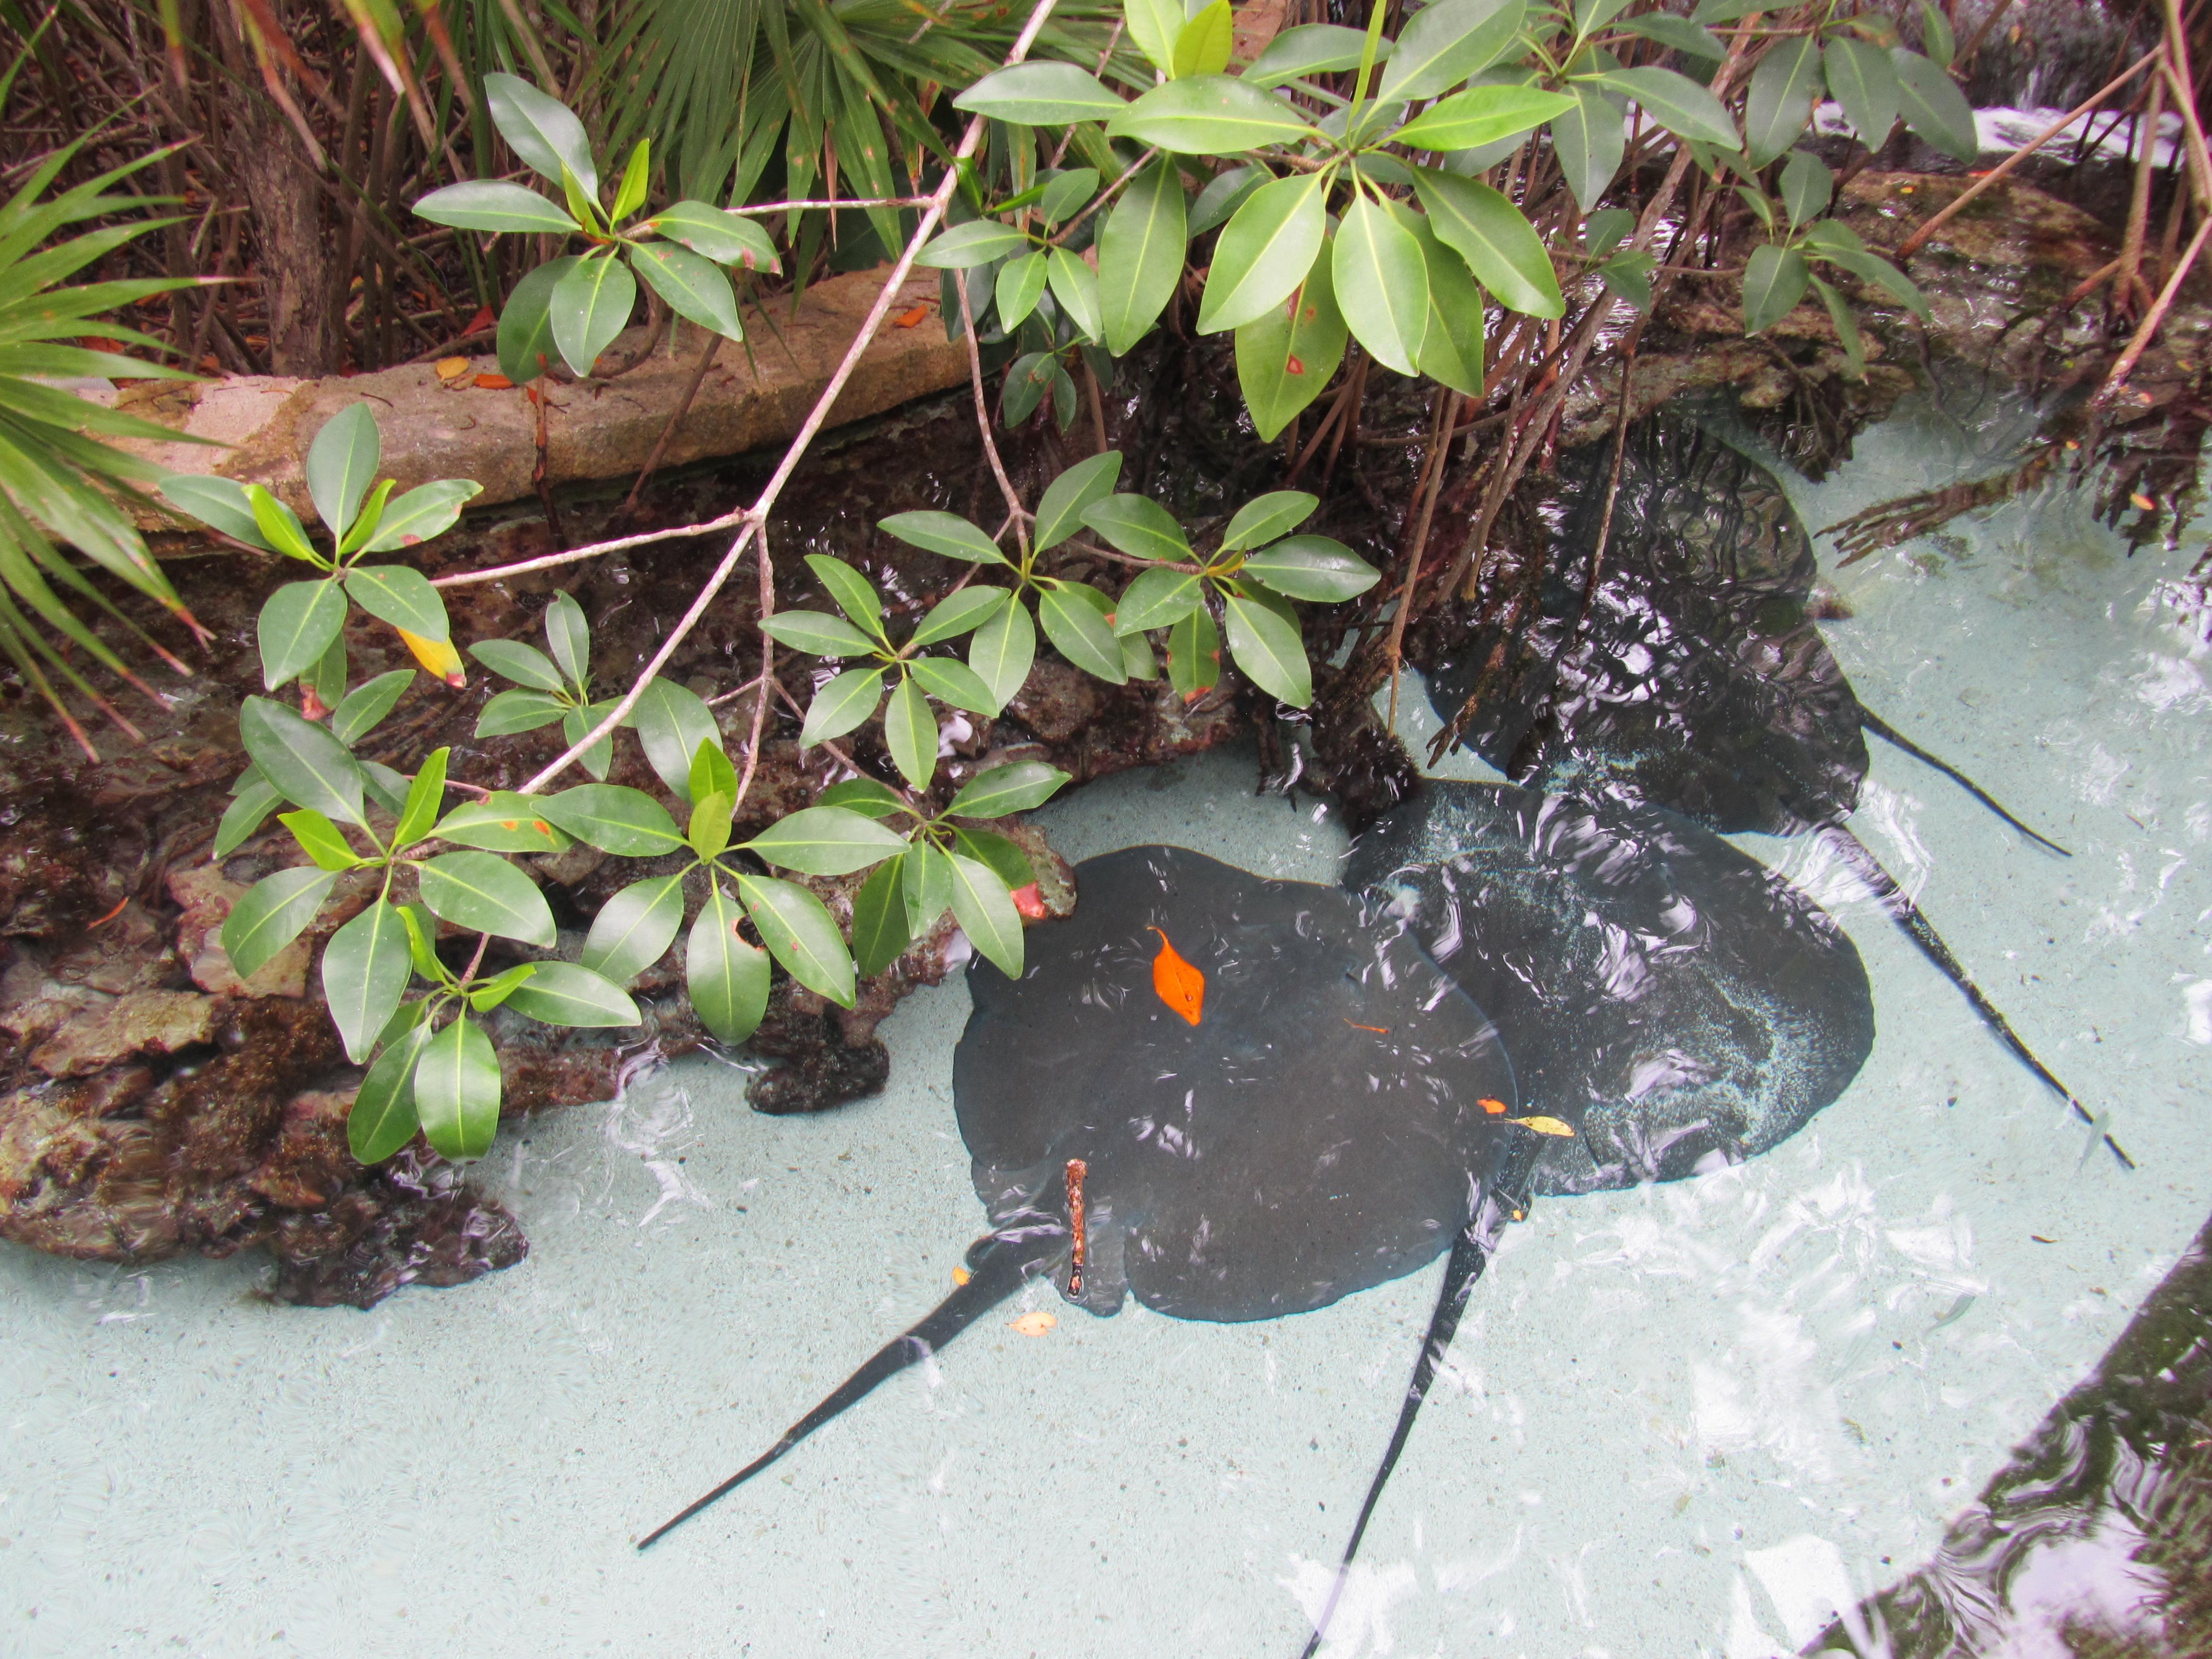 Riviera Maya Mexico Flora And Fauna Samantha Cleminson